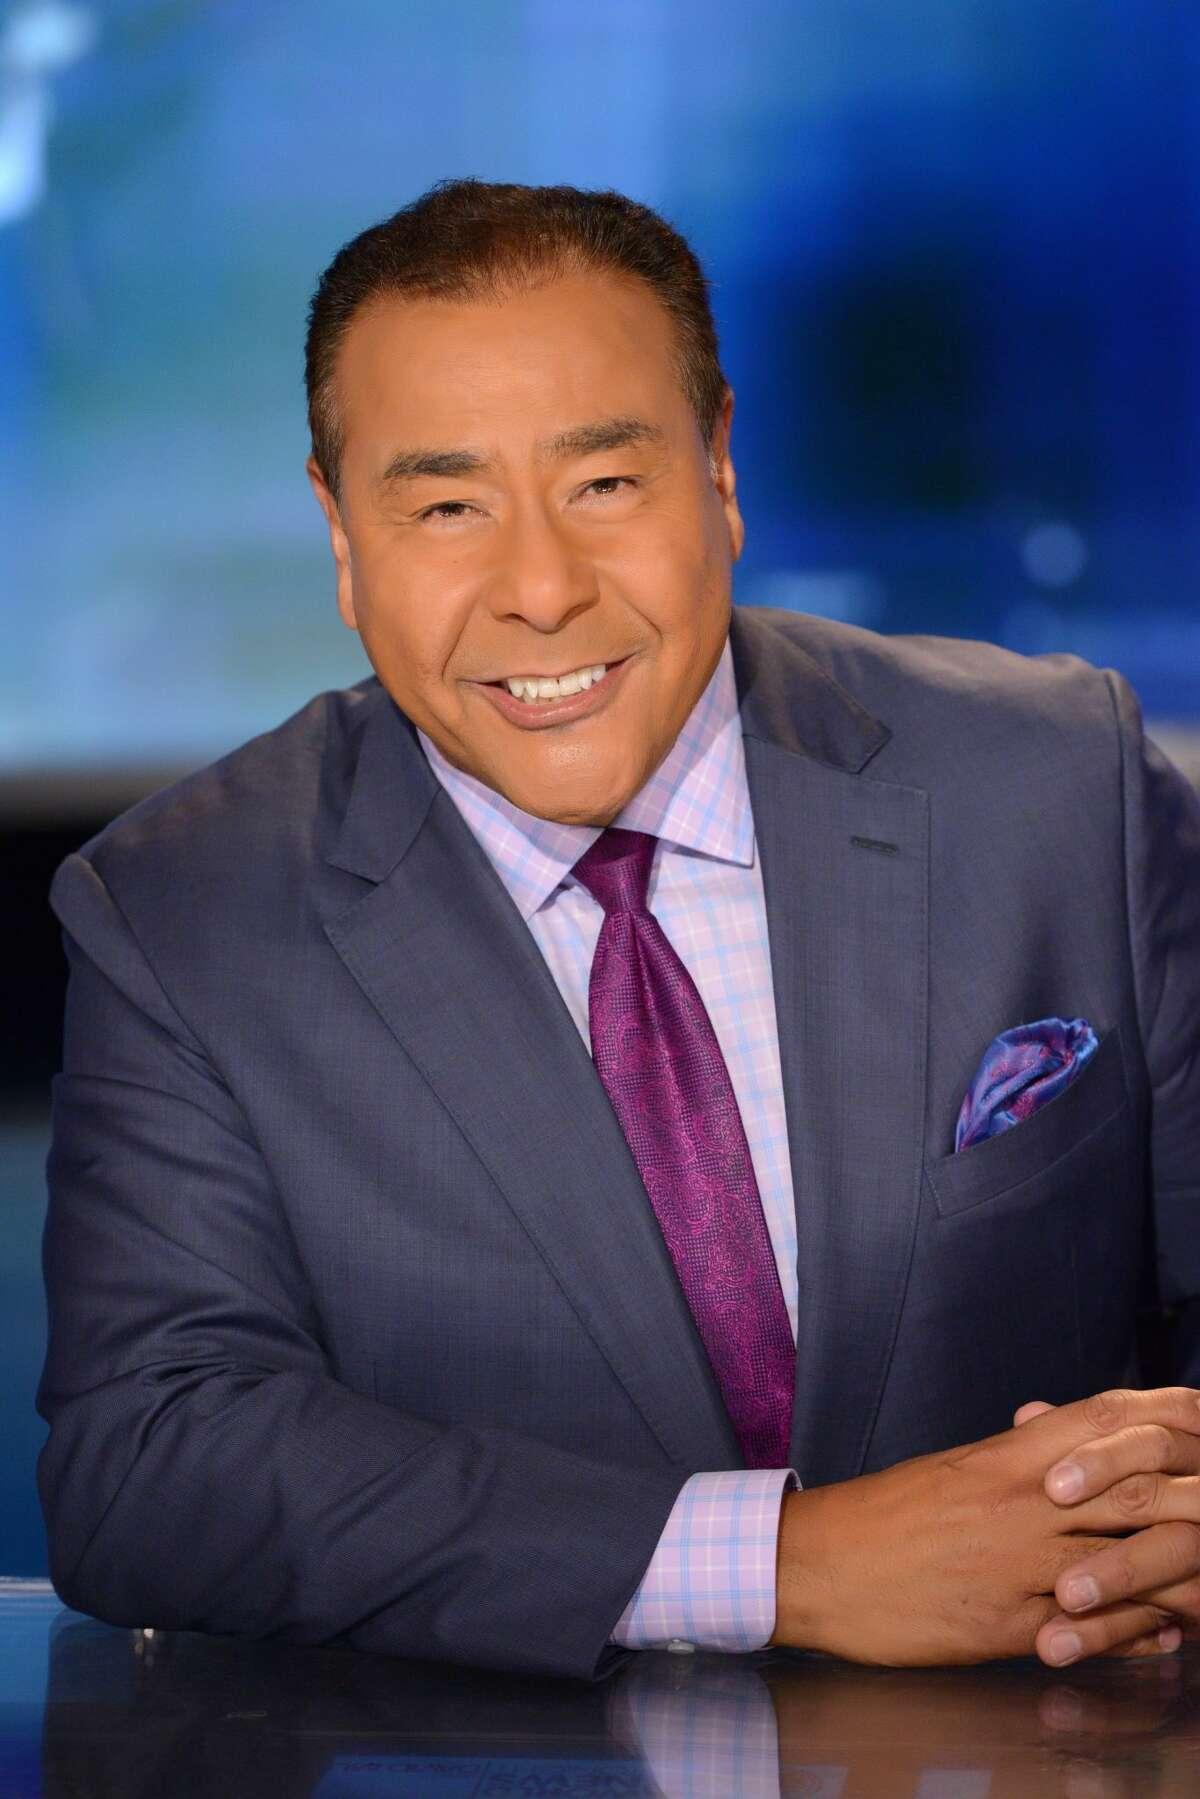 ABC NEWS - John Quiñones